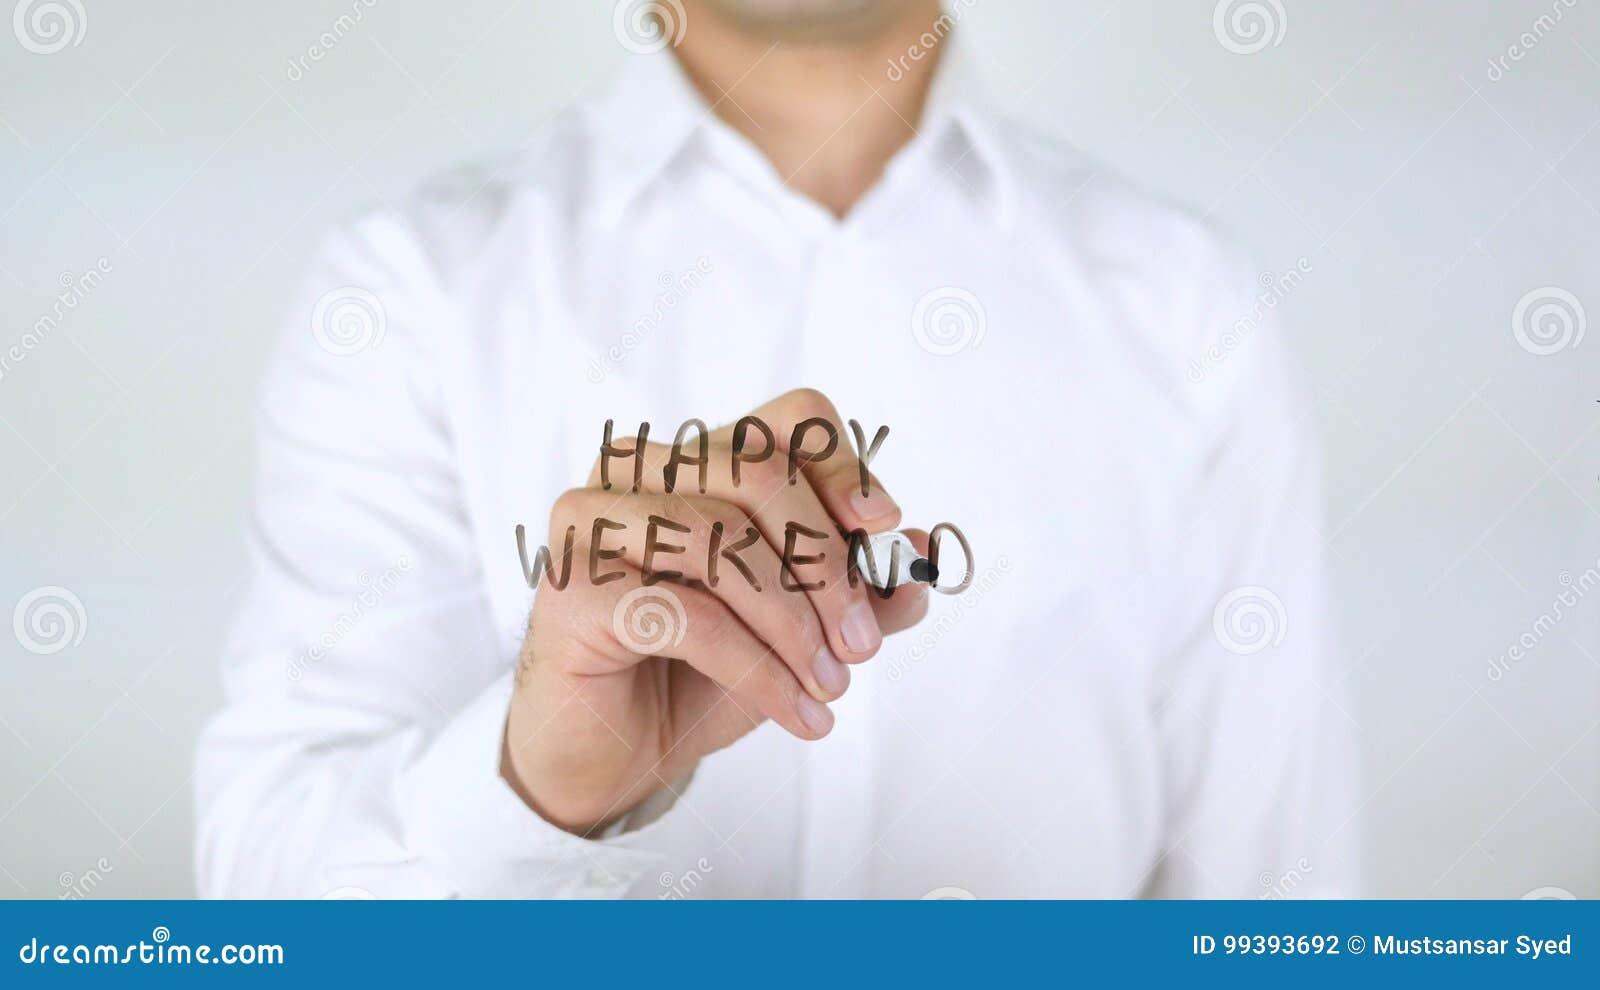 Gelukkig Weekend, Zakenman Writing op Glas